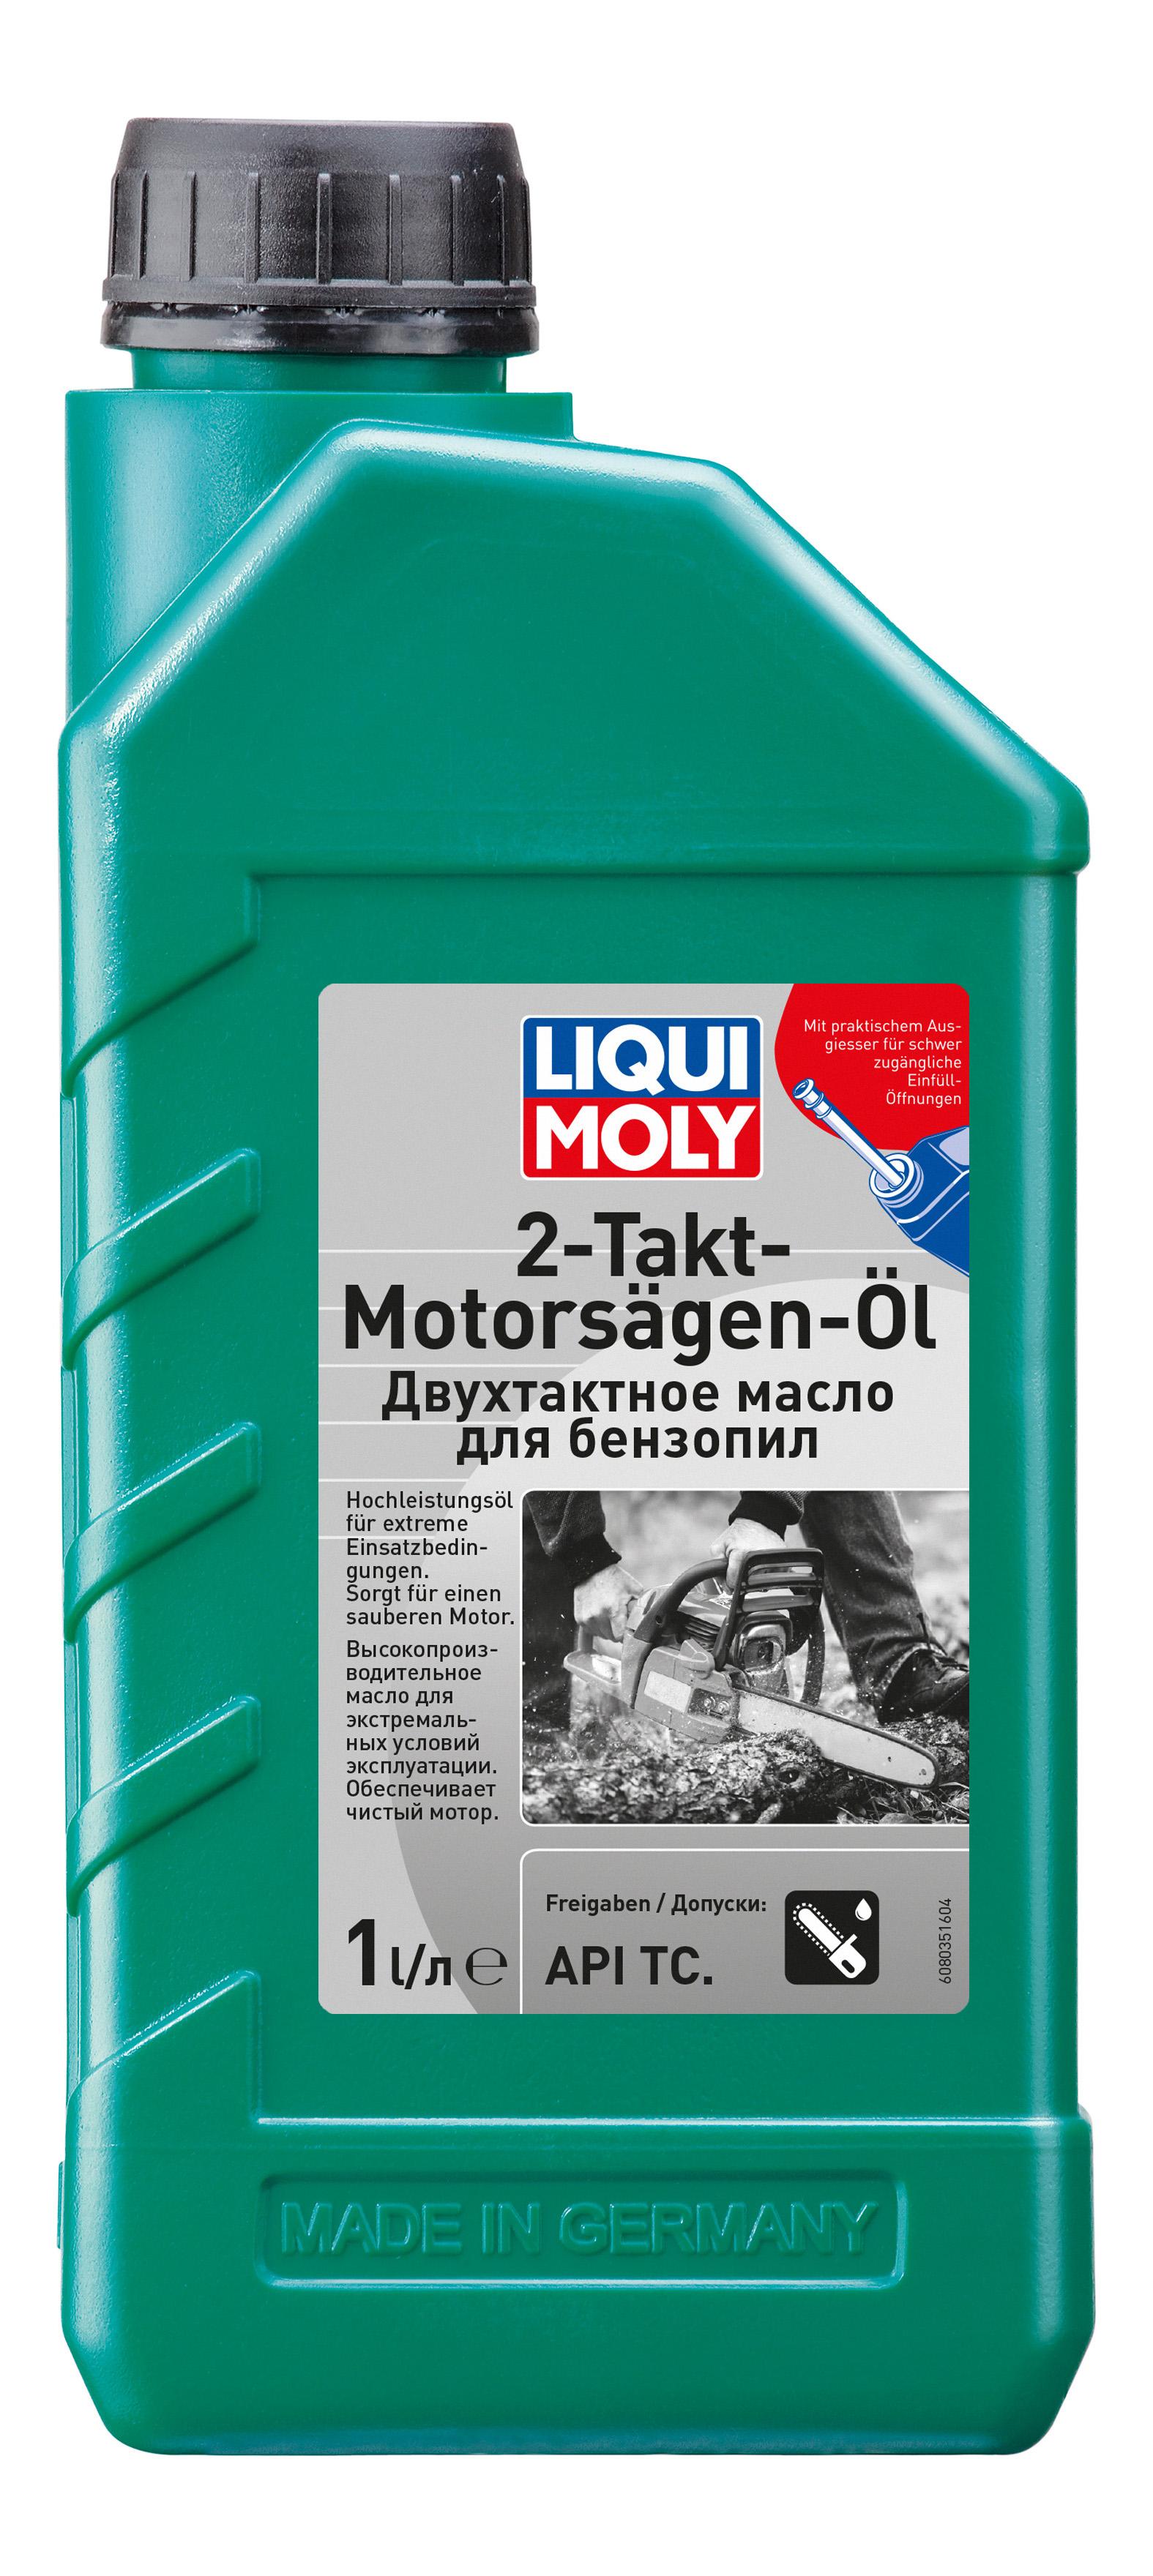 LIQUI MOLY 2-TAKT-MOTORSAGEN-OIL